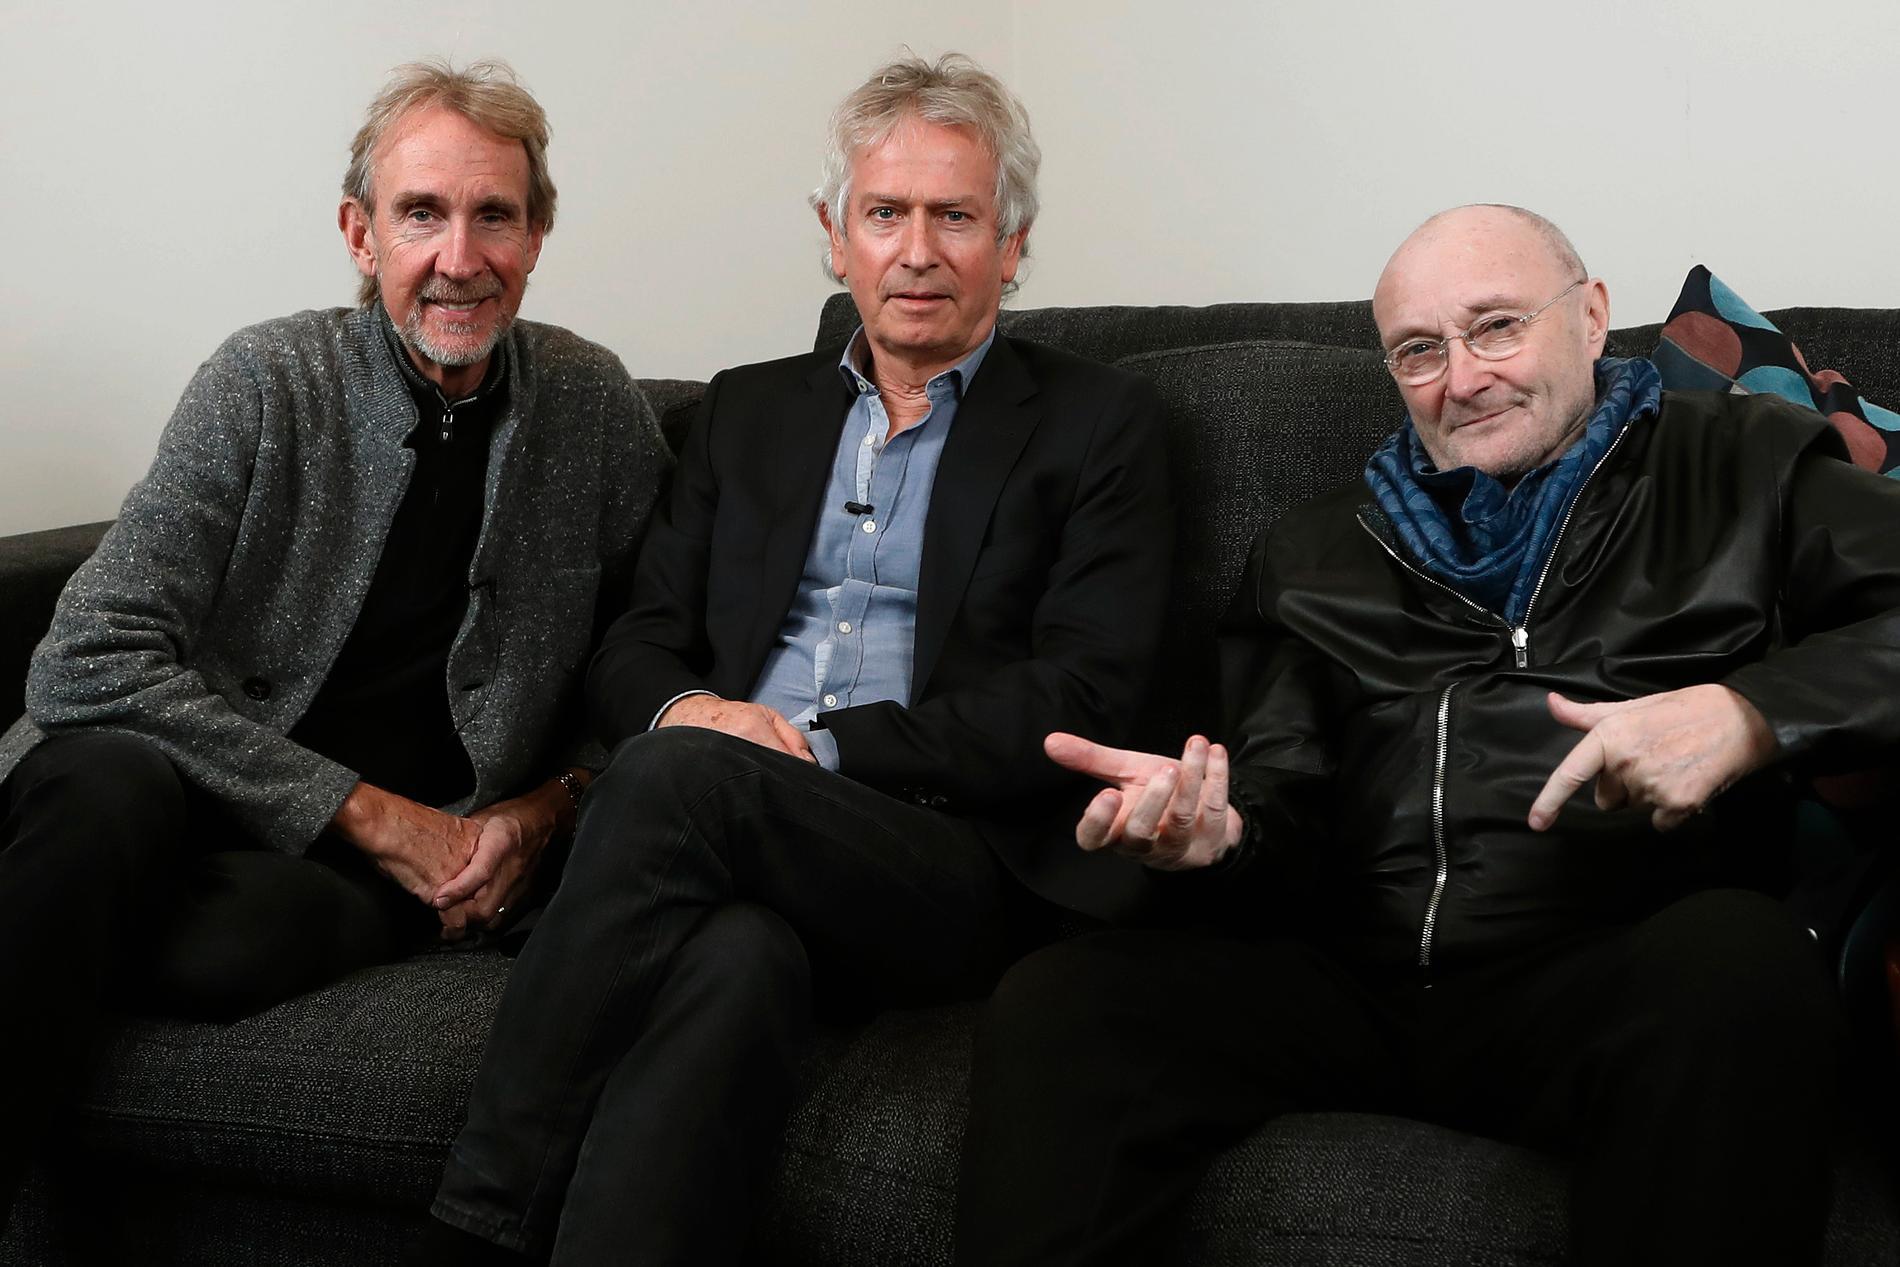 Mike Rutherford, Tony Banks och Phil Collins i Genesis. Arkivbild.